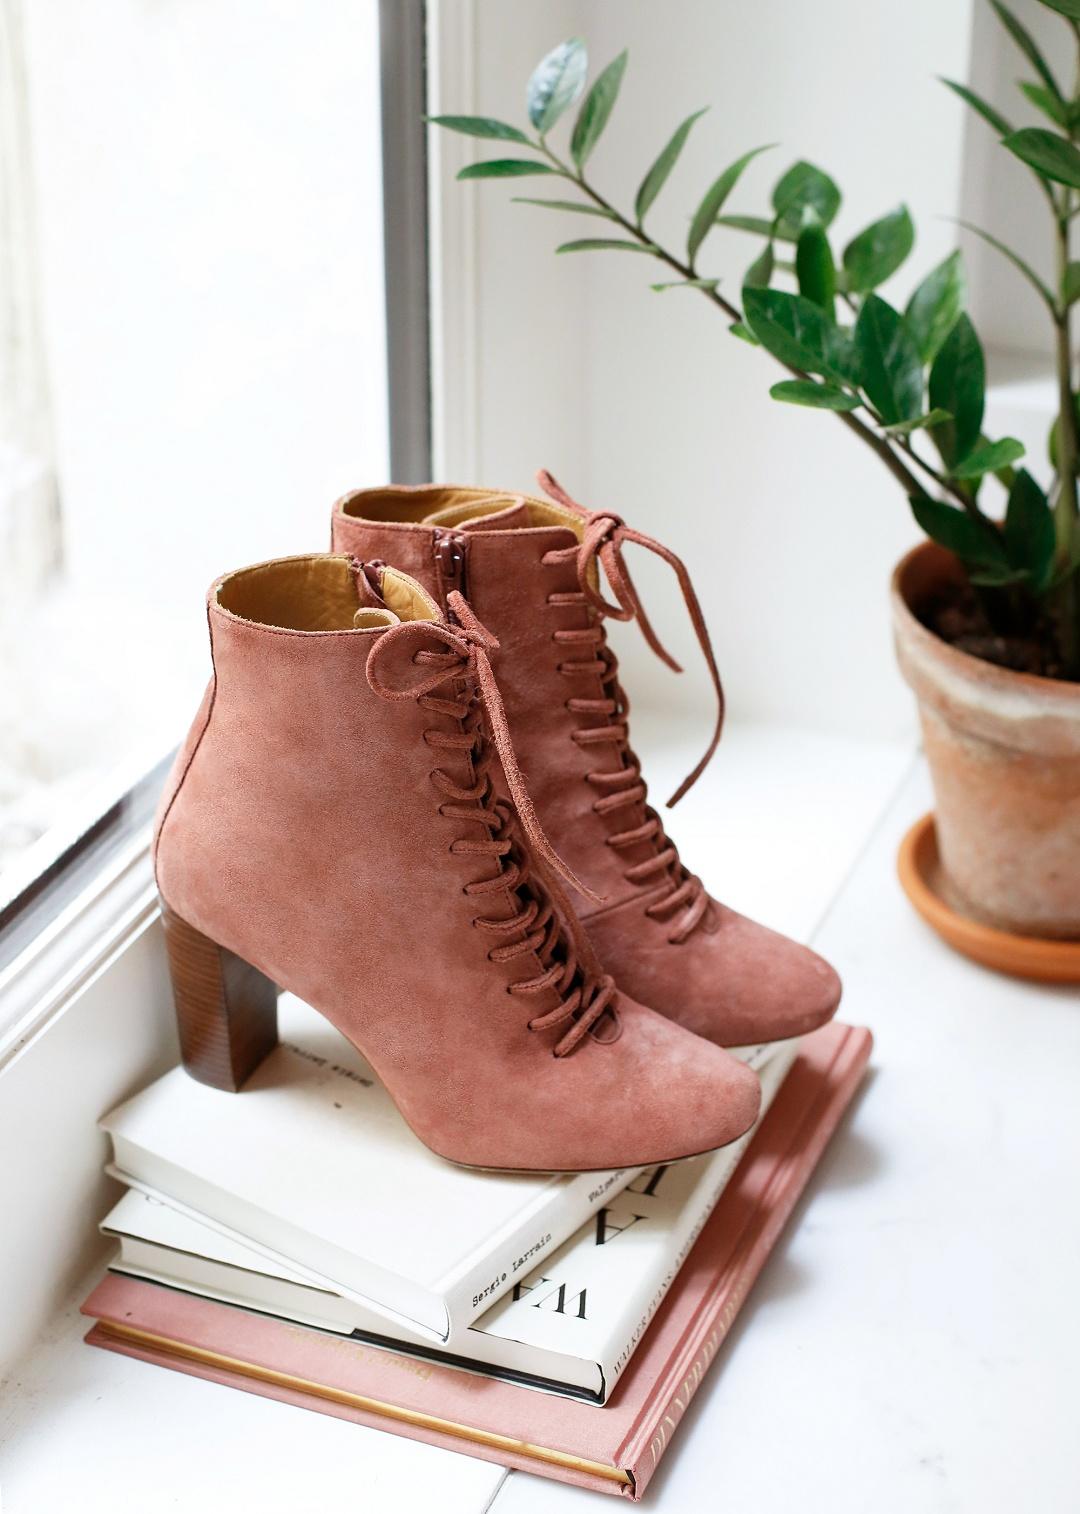 Wear amazing boots you will wear loads after the wedding! Sezane